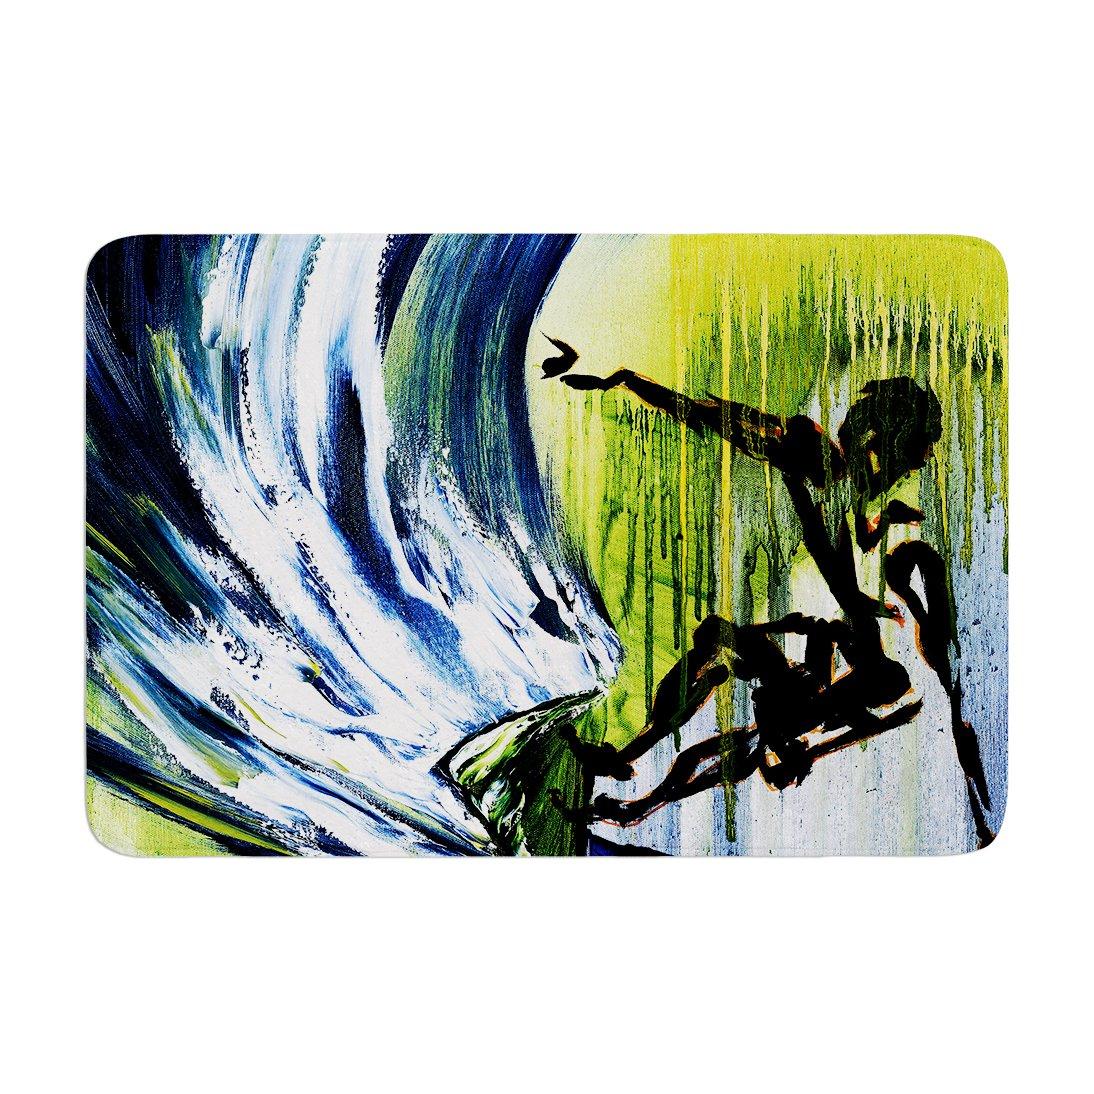 Kess InHouse Josh Serafin Greenroom Green Surfer Memory Foam Bath Mat 17 by 24